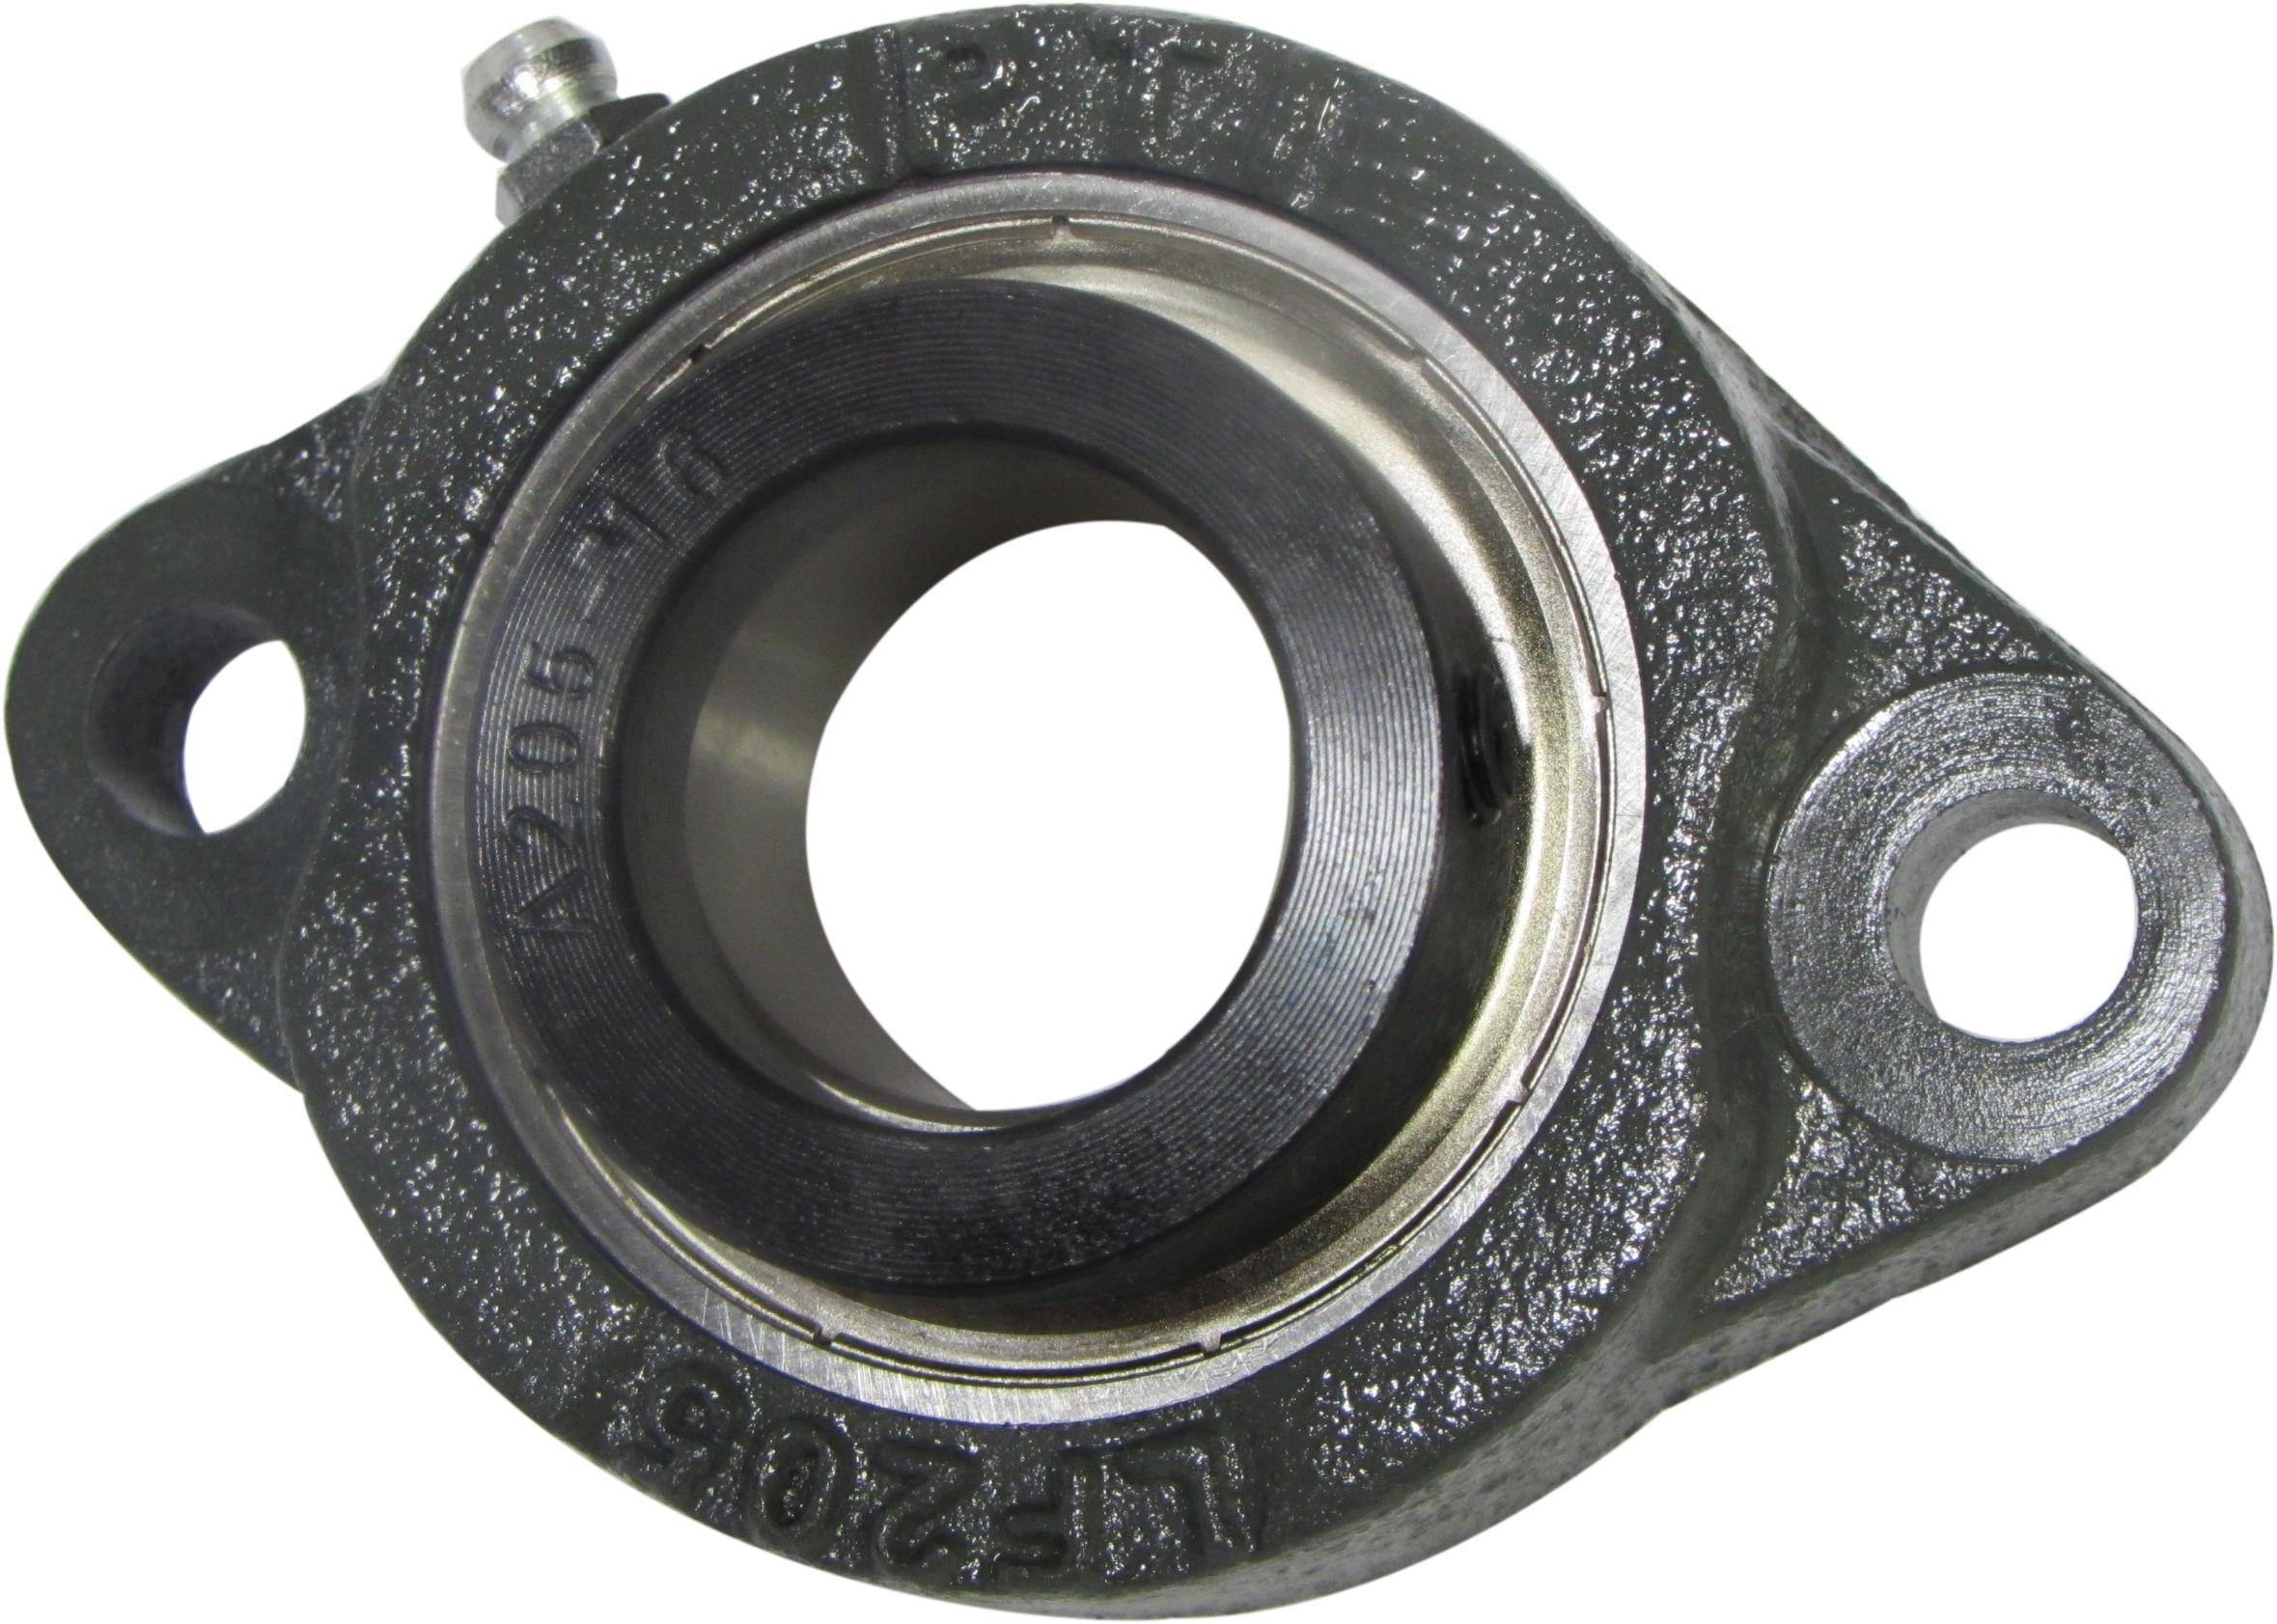 LF 200 Silver Series